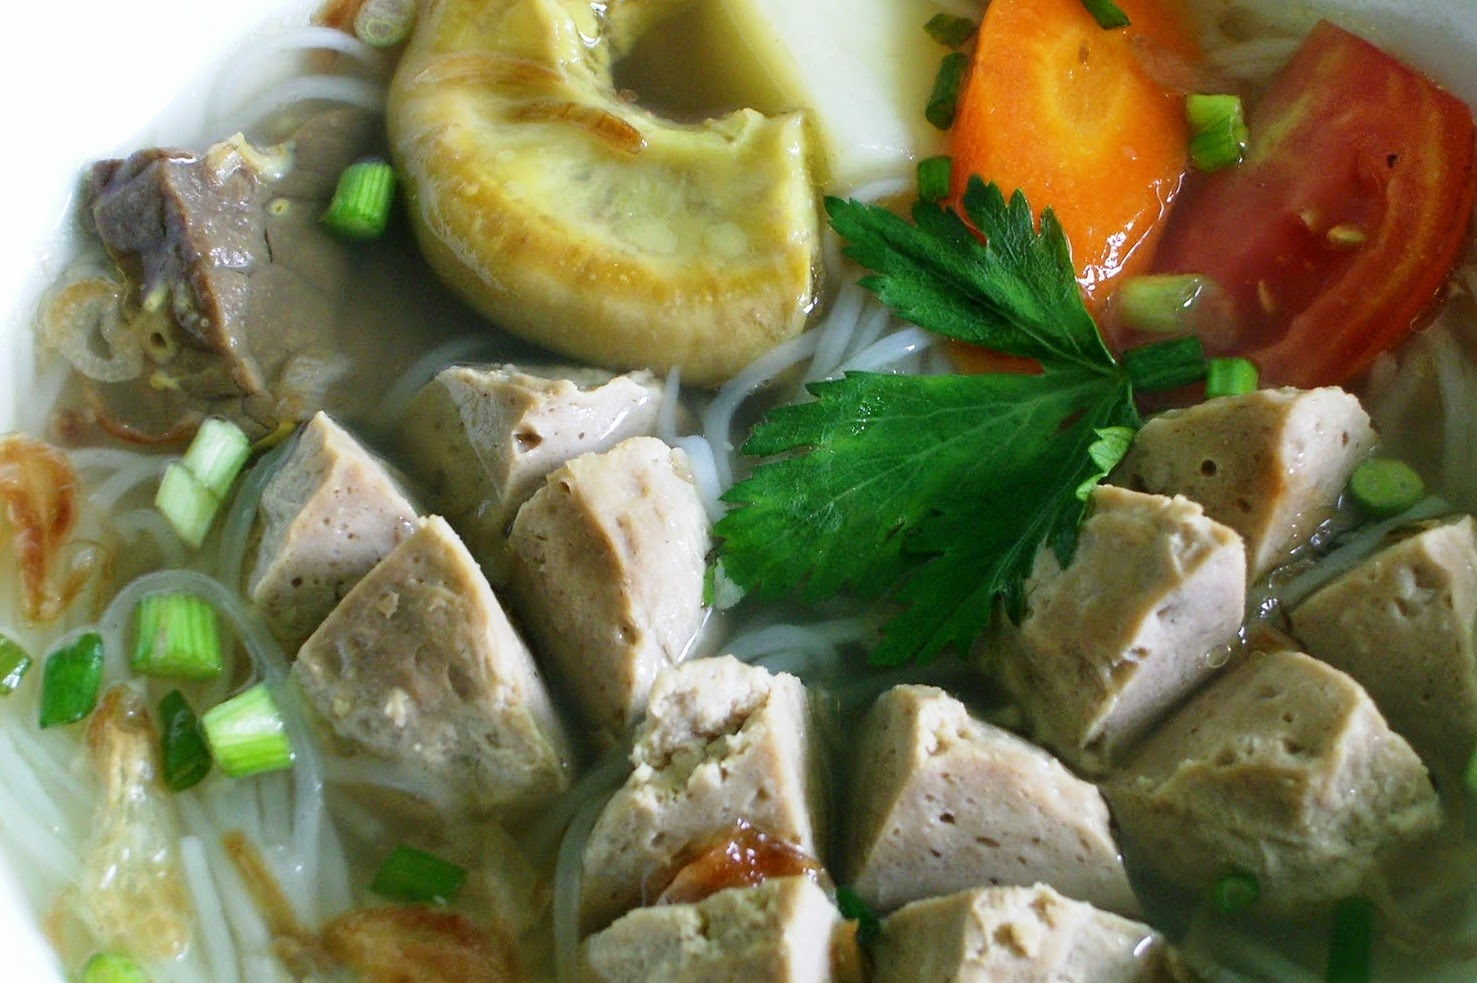 Resep dan Cara Membuat Bakso Daging Sapi Mudah dan Nikmat+Kandungan Gizi